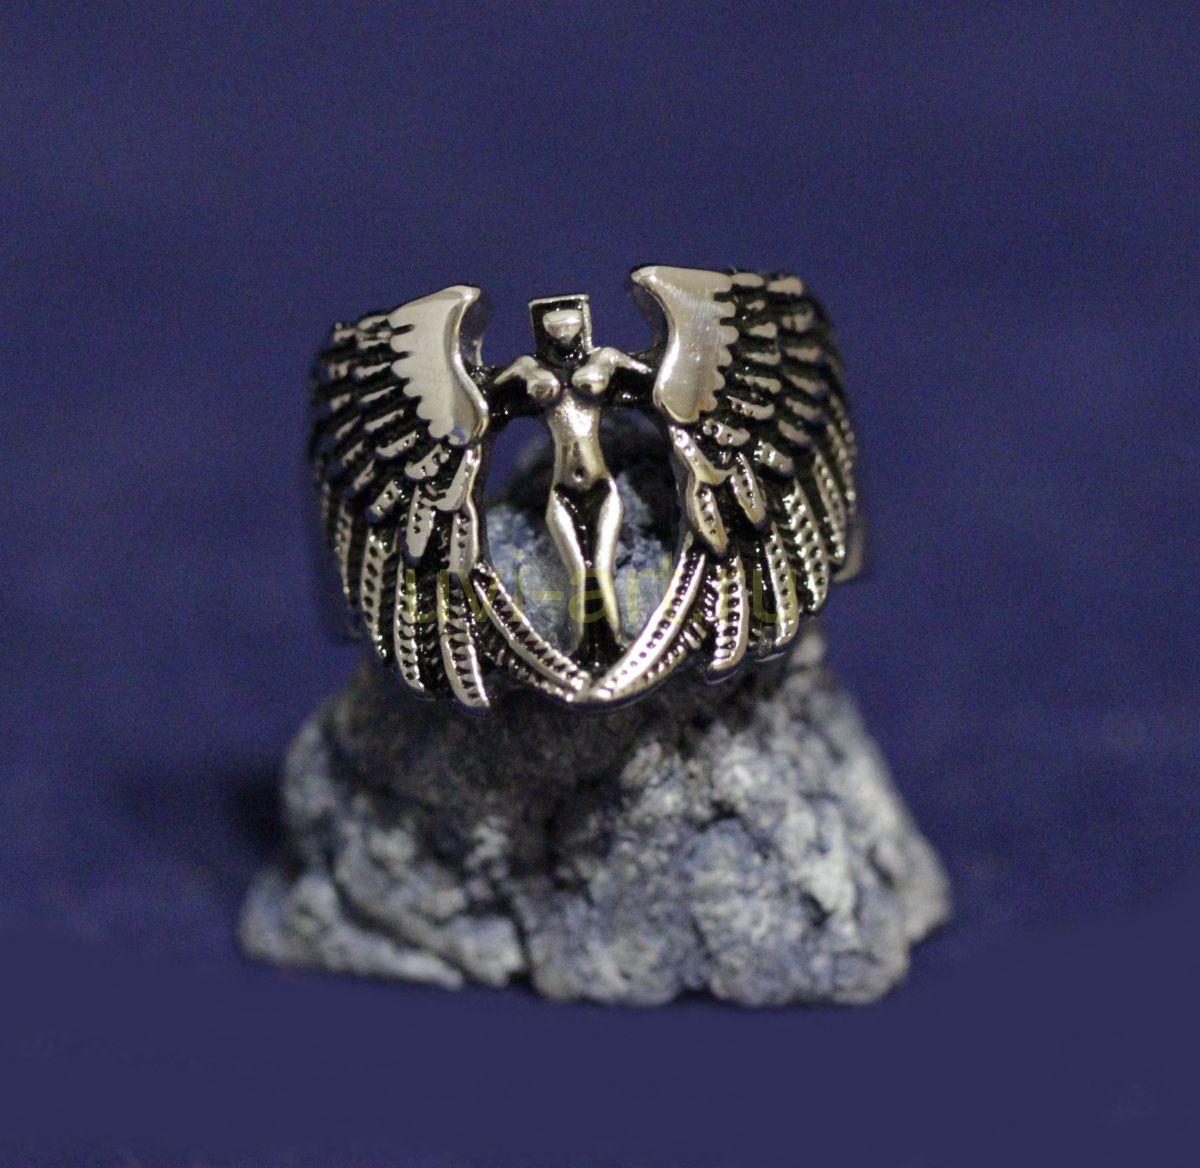 "Стальное мужское кольцо-печатка Spikes ""Крылья ангела"" (арт. 880171)"